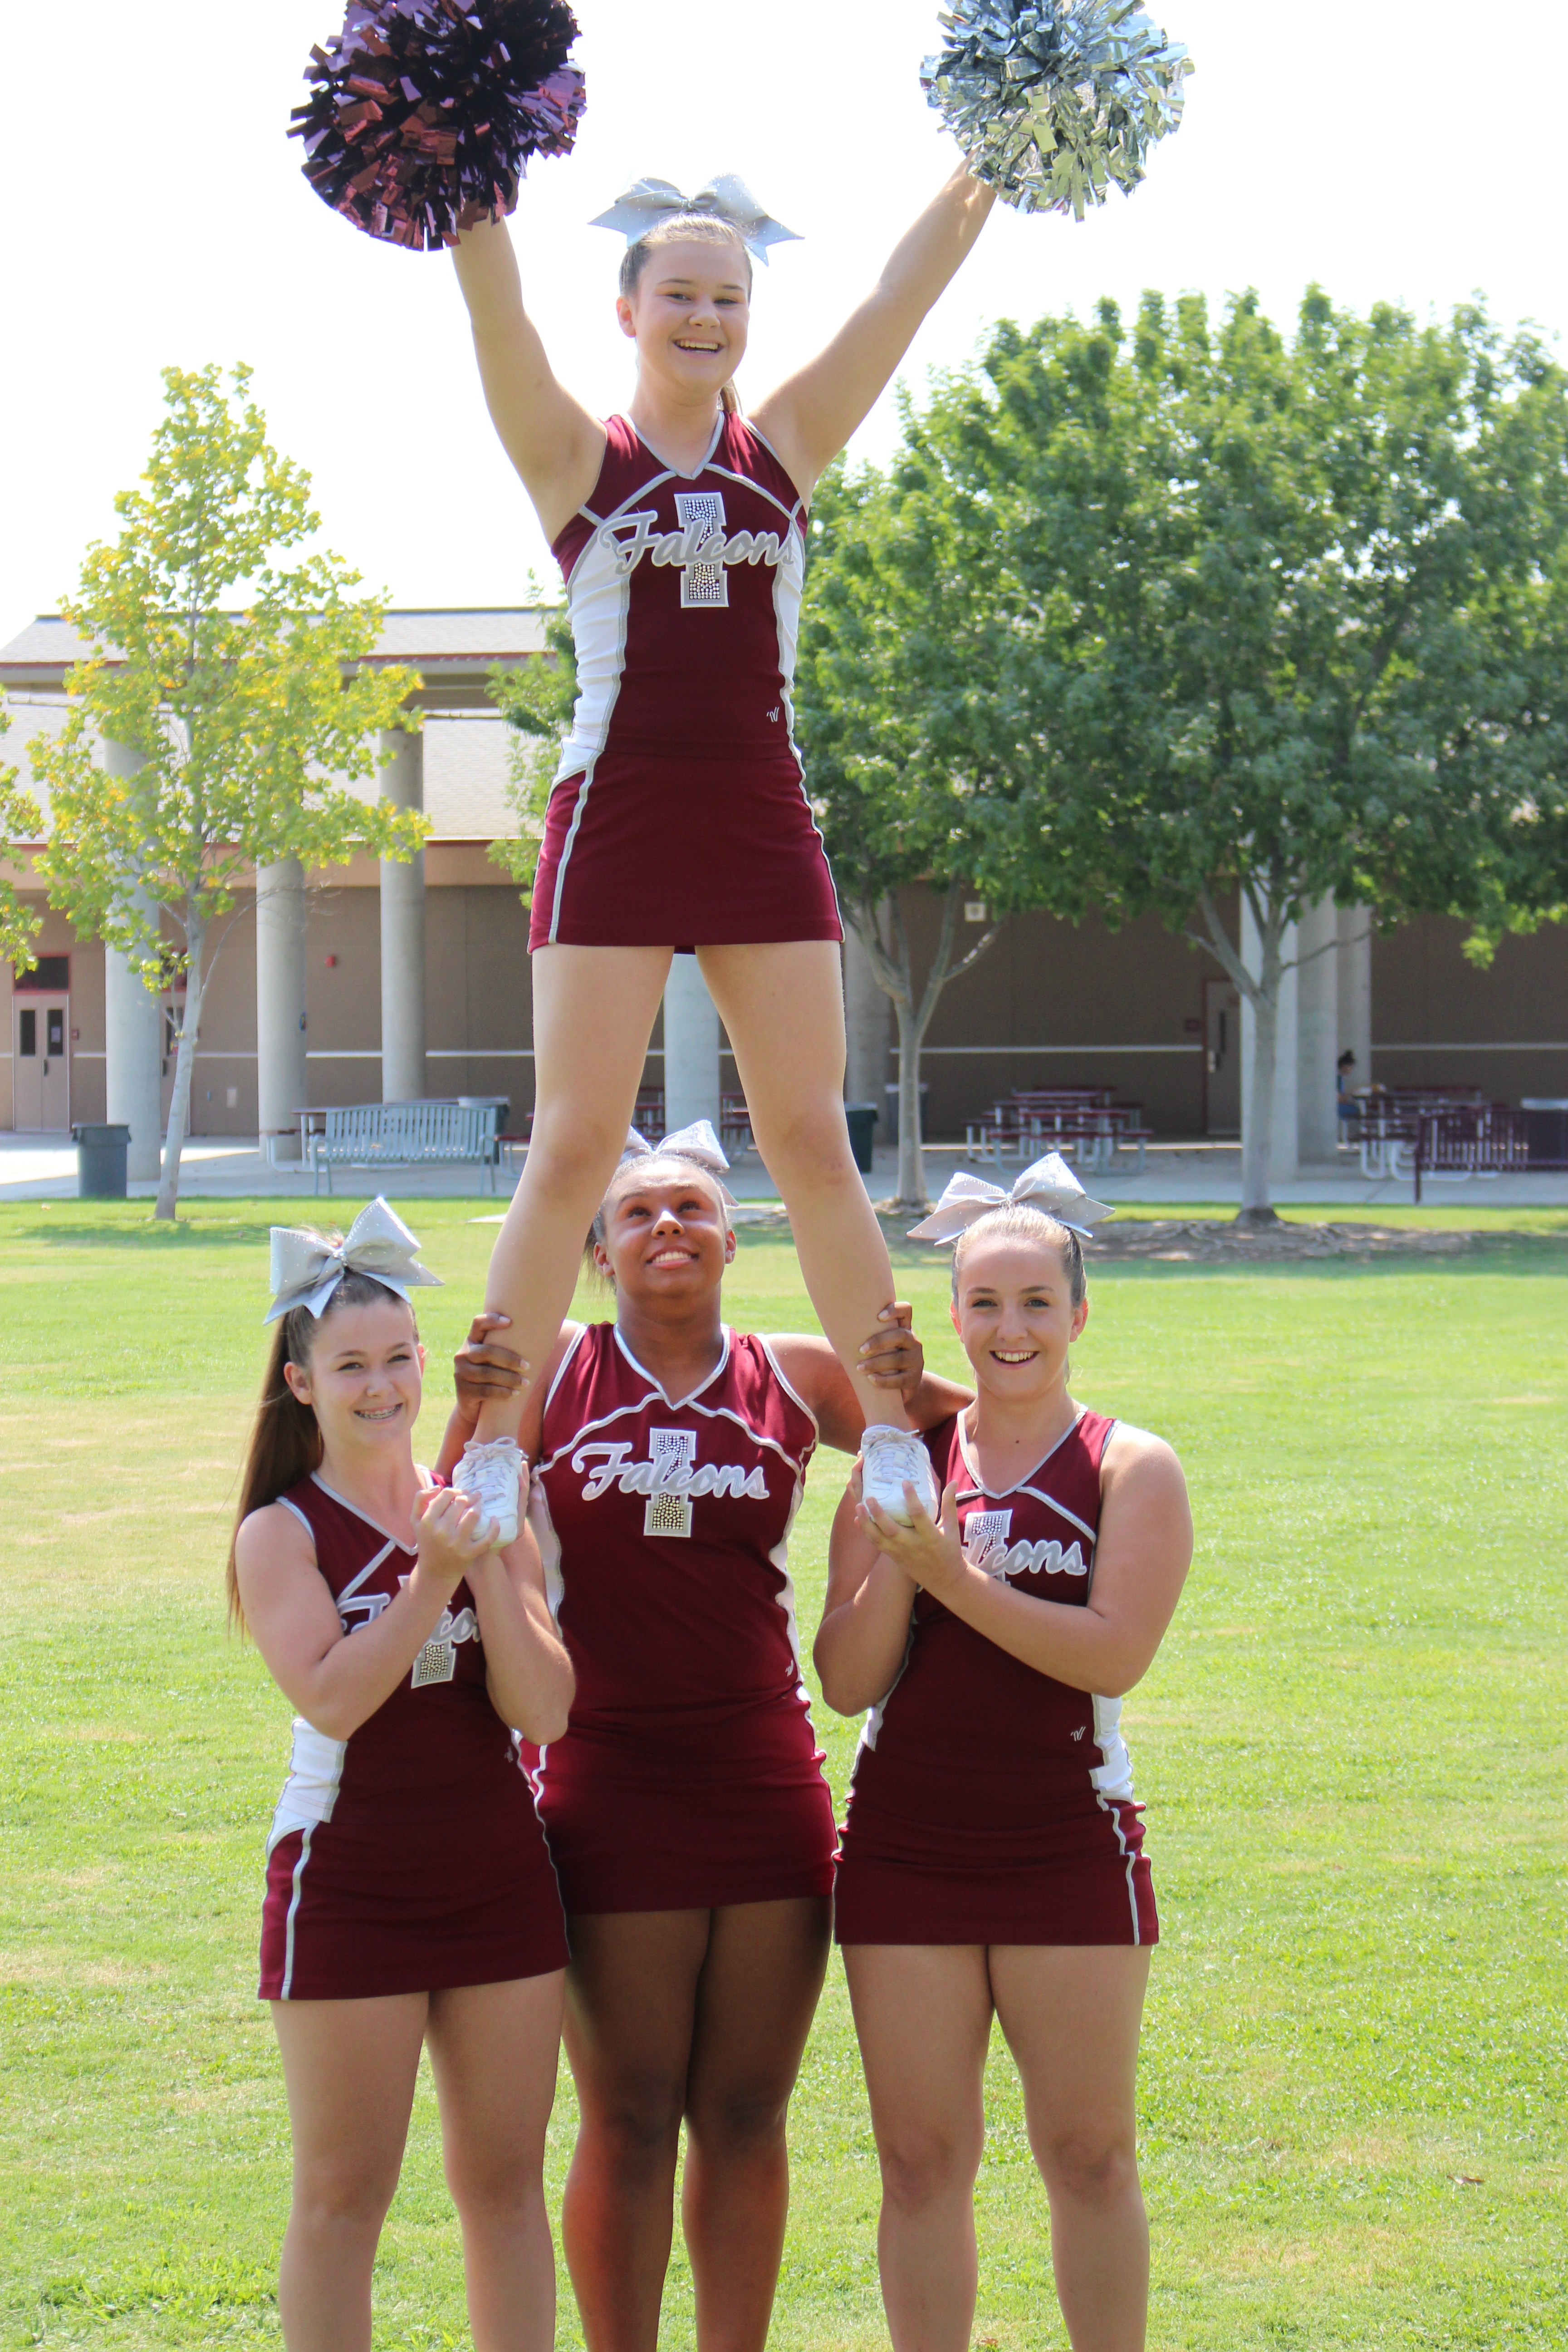 Sexy High School Cheerleader Pics